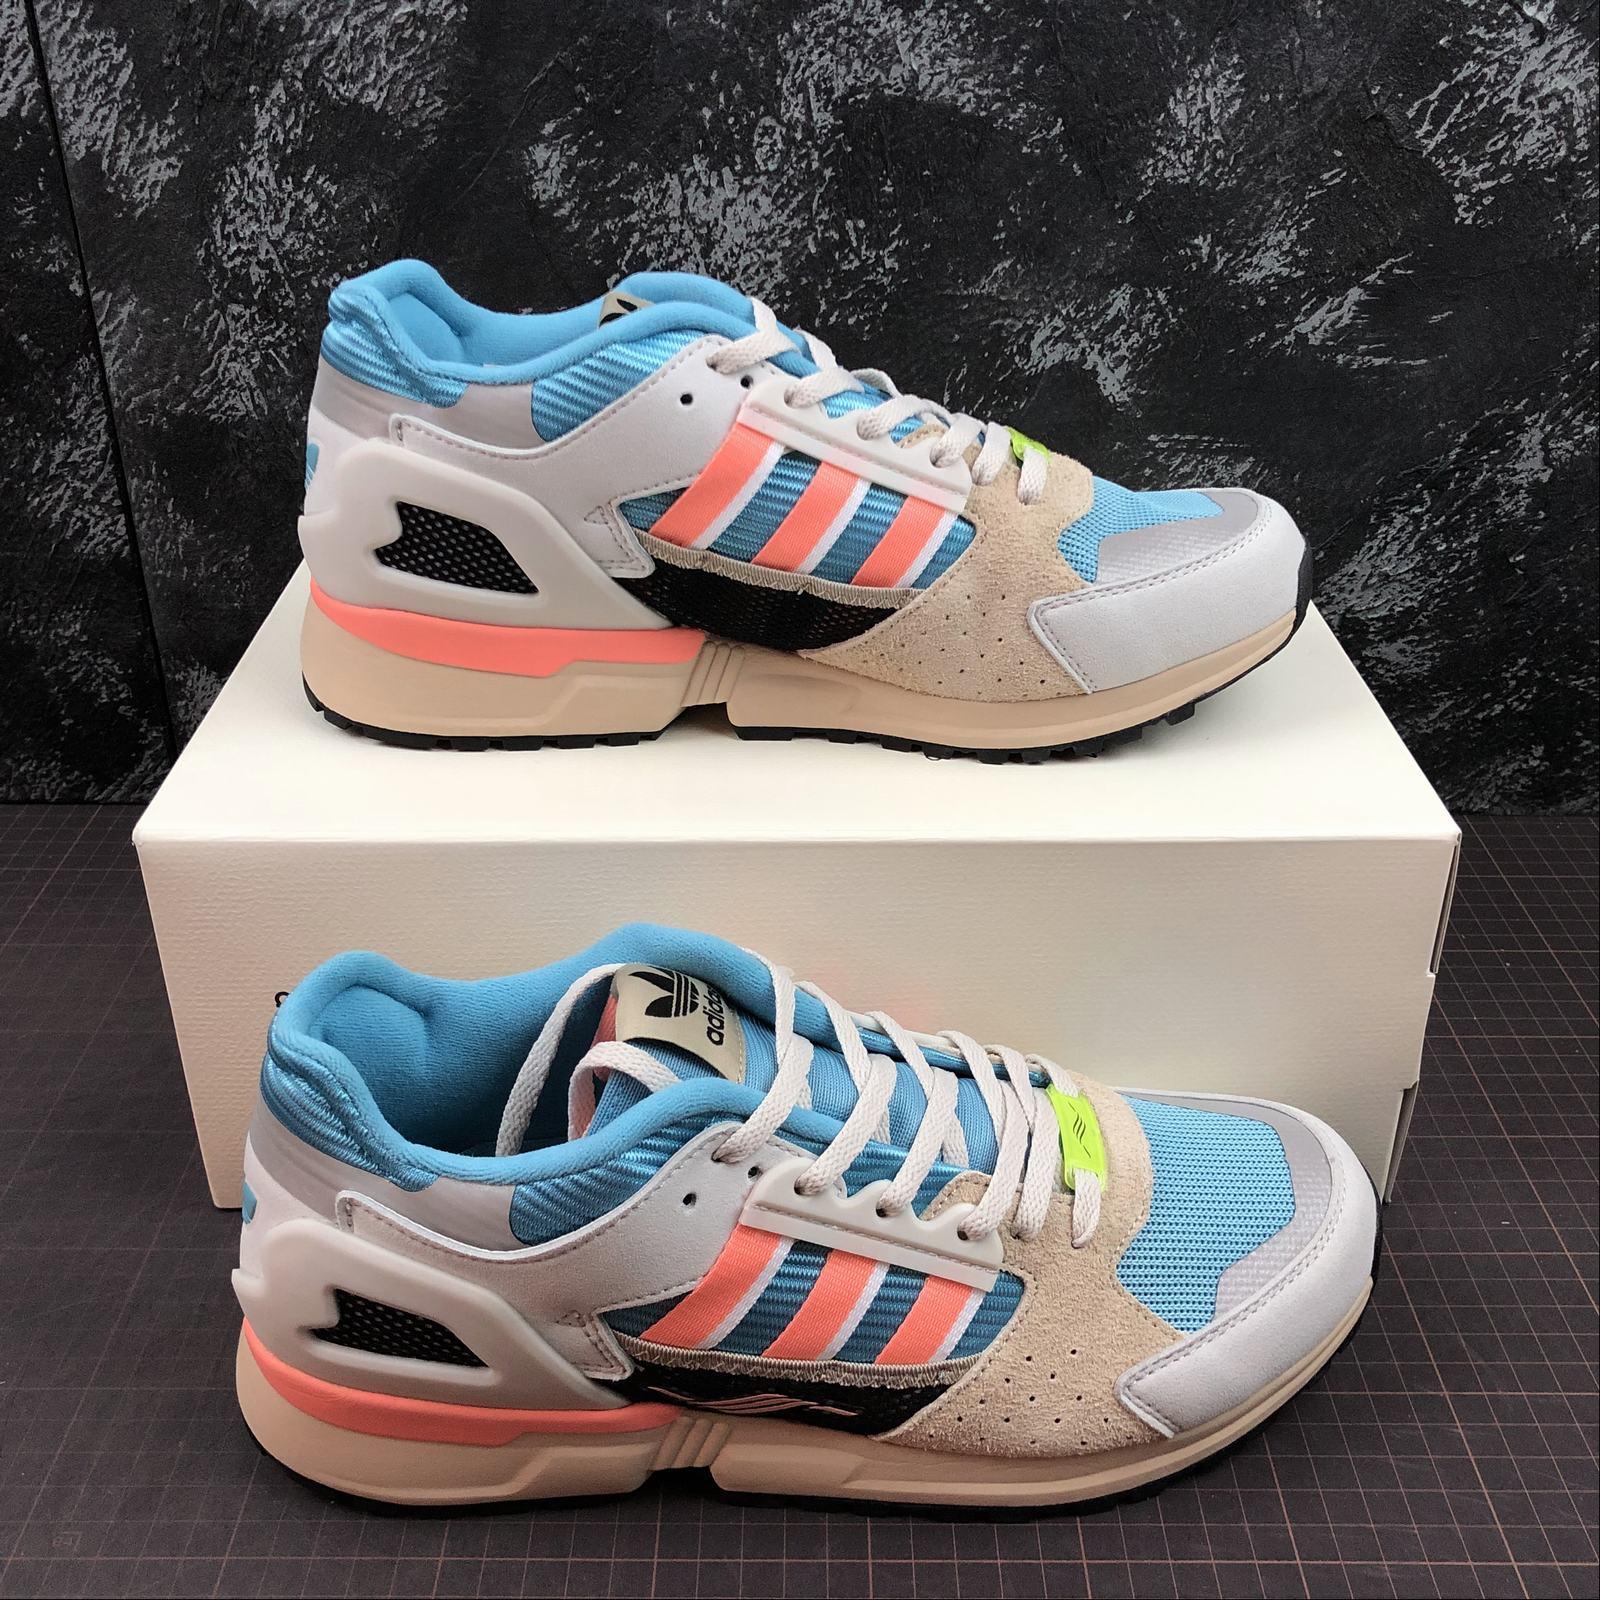 giay-sneaker-adidas-zx10000-c-ee9485